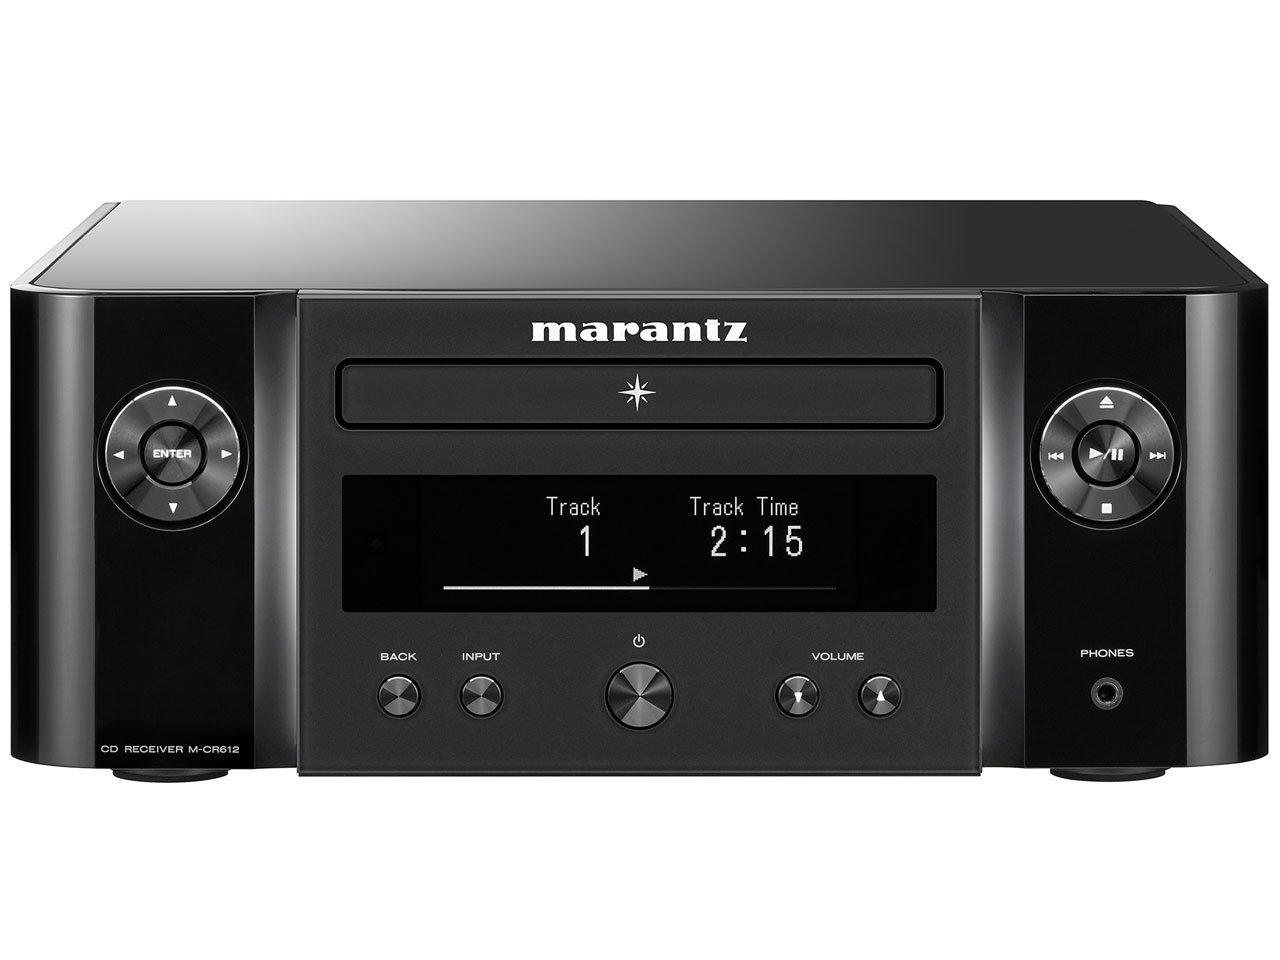 Marantz M-CR612 多功能音響主機 (Philips Samsung MB QUART Klipsch)